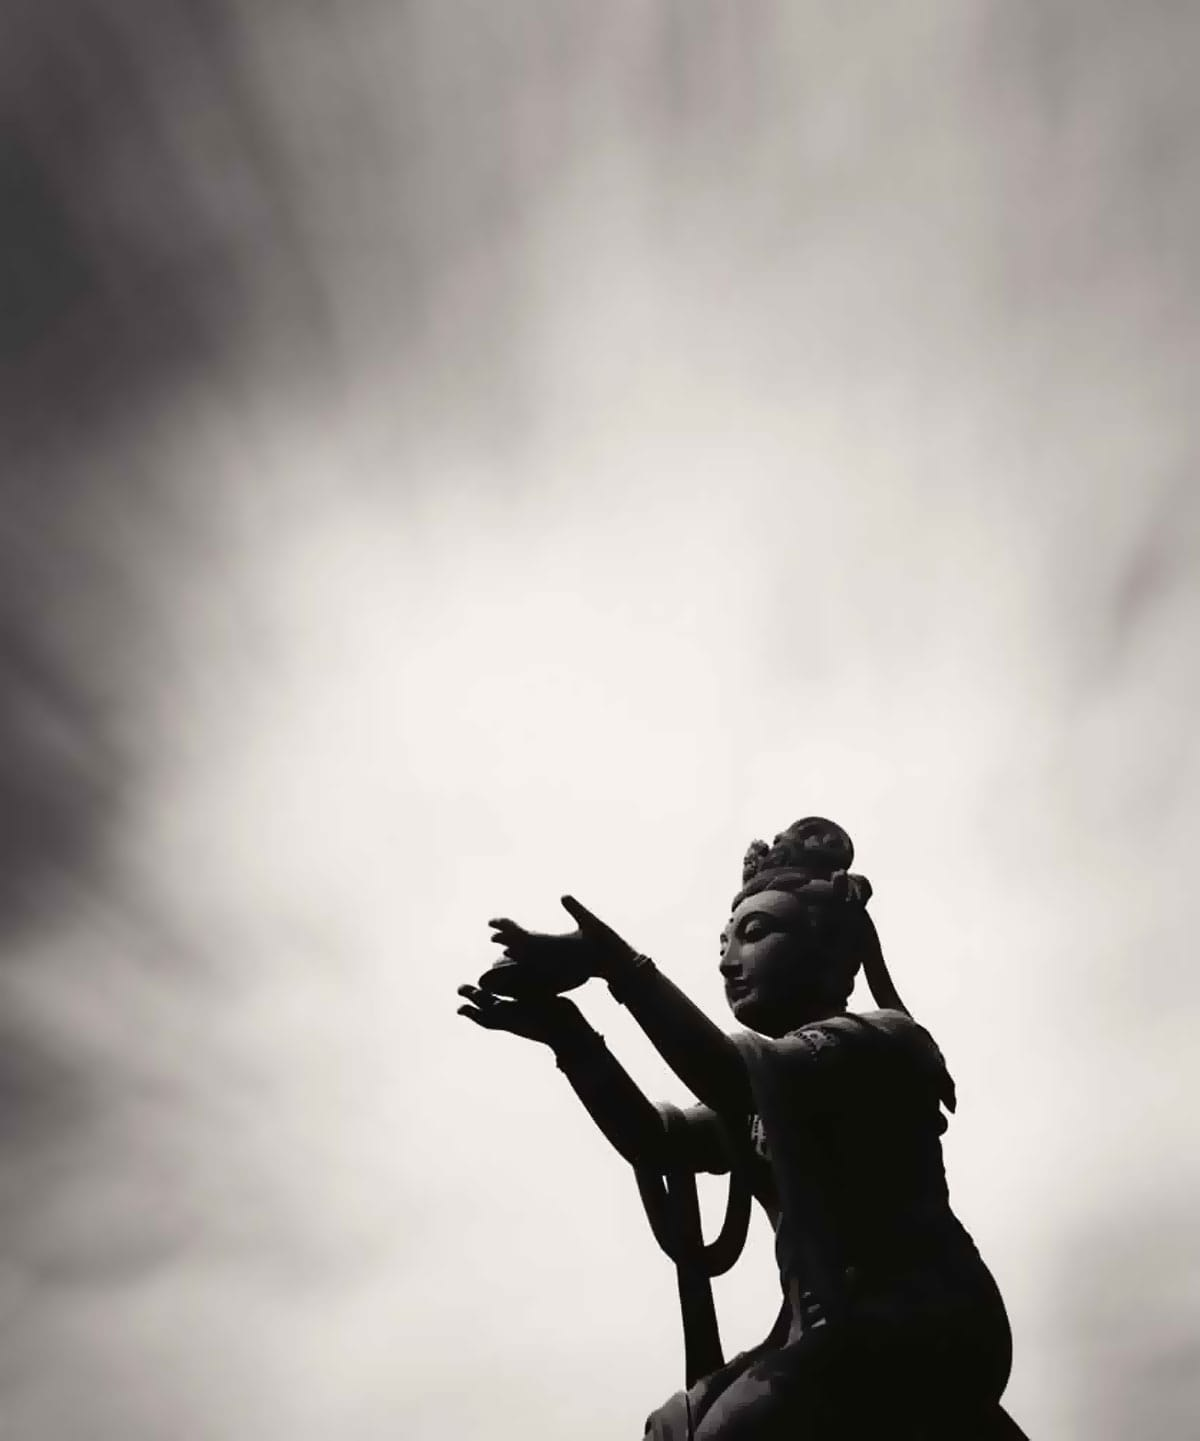 gratitude, jeff wilson, buddhism, lion's roar, buddhadharma